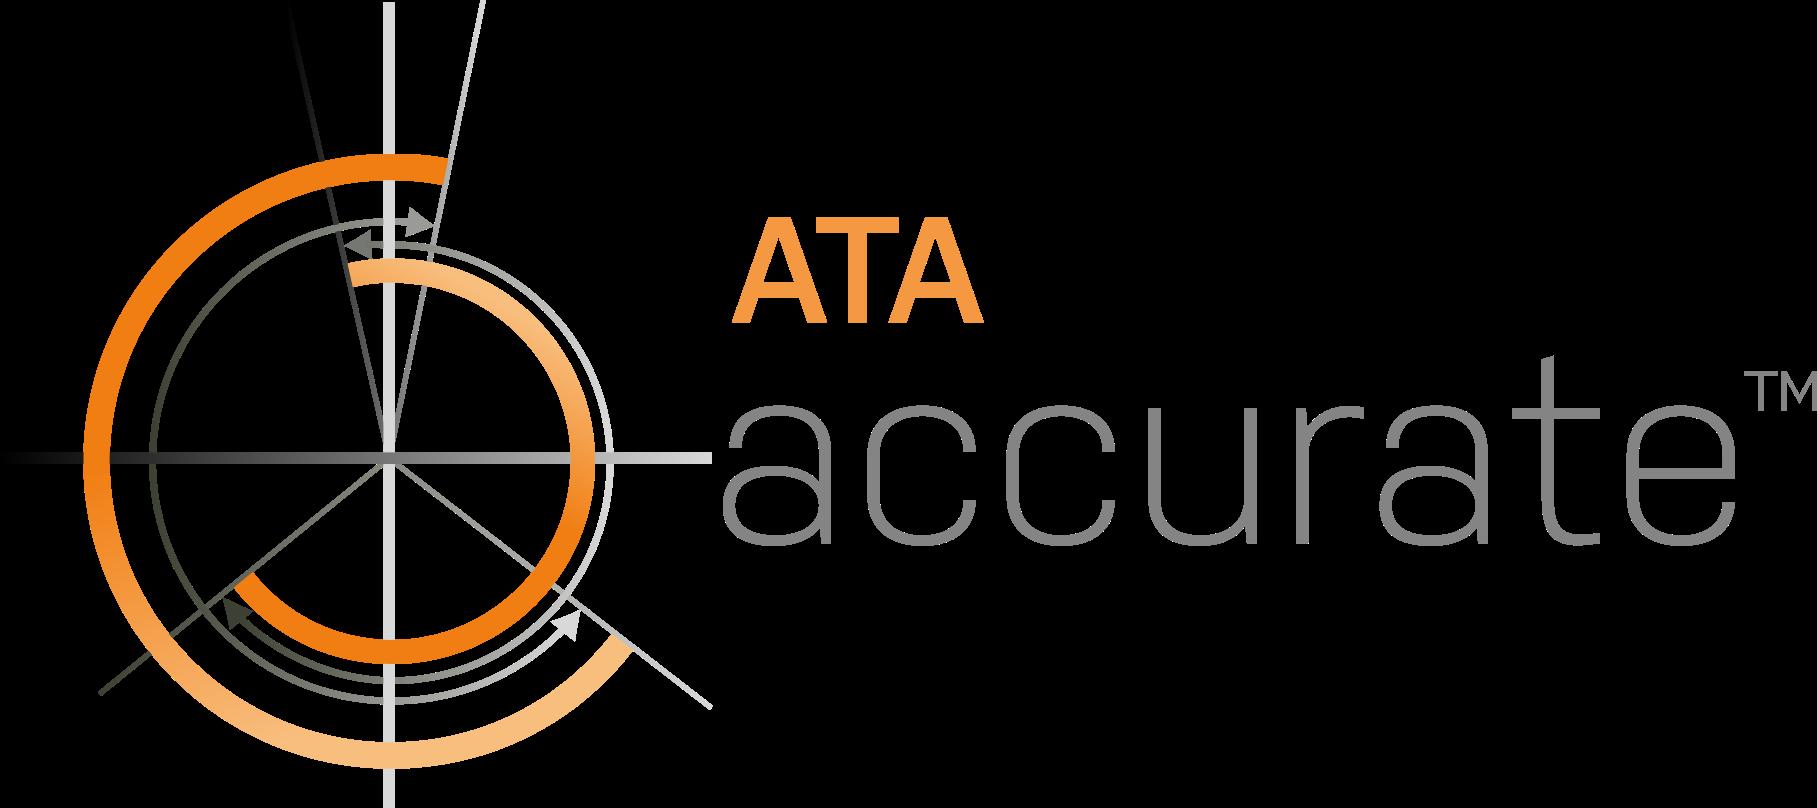 ATA Accurate Logo.png